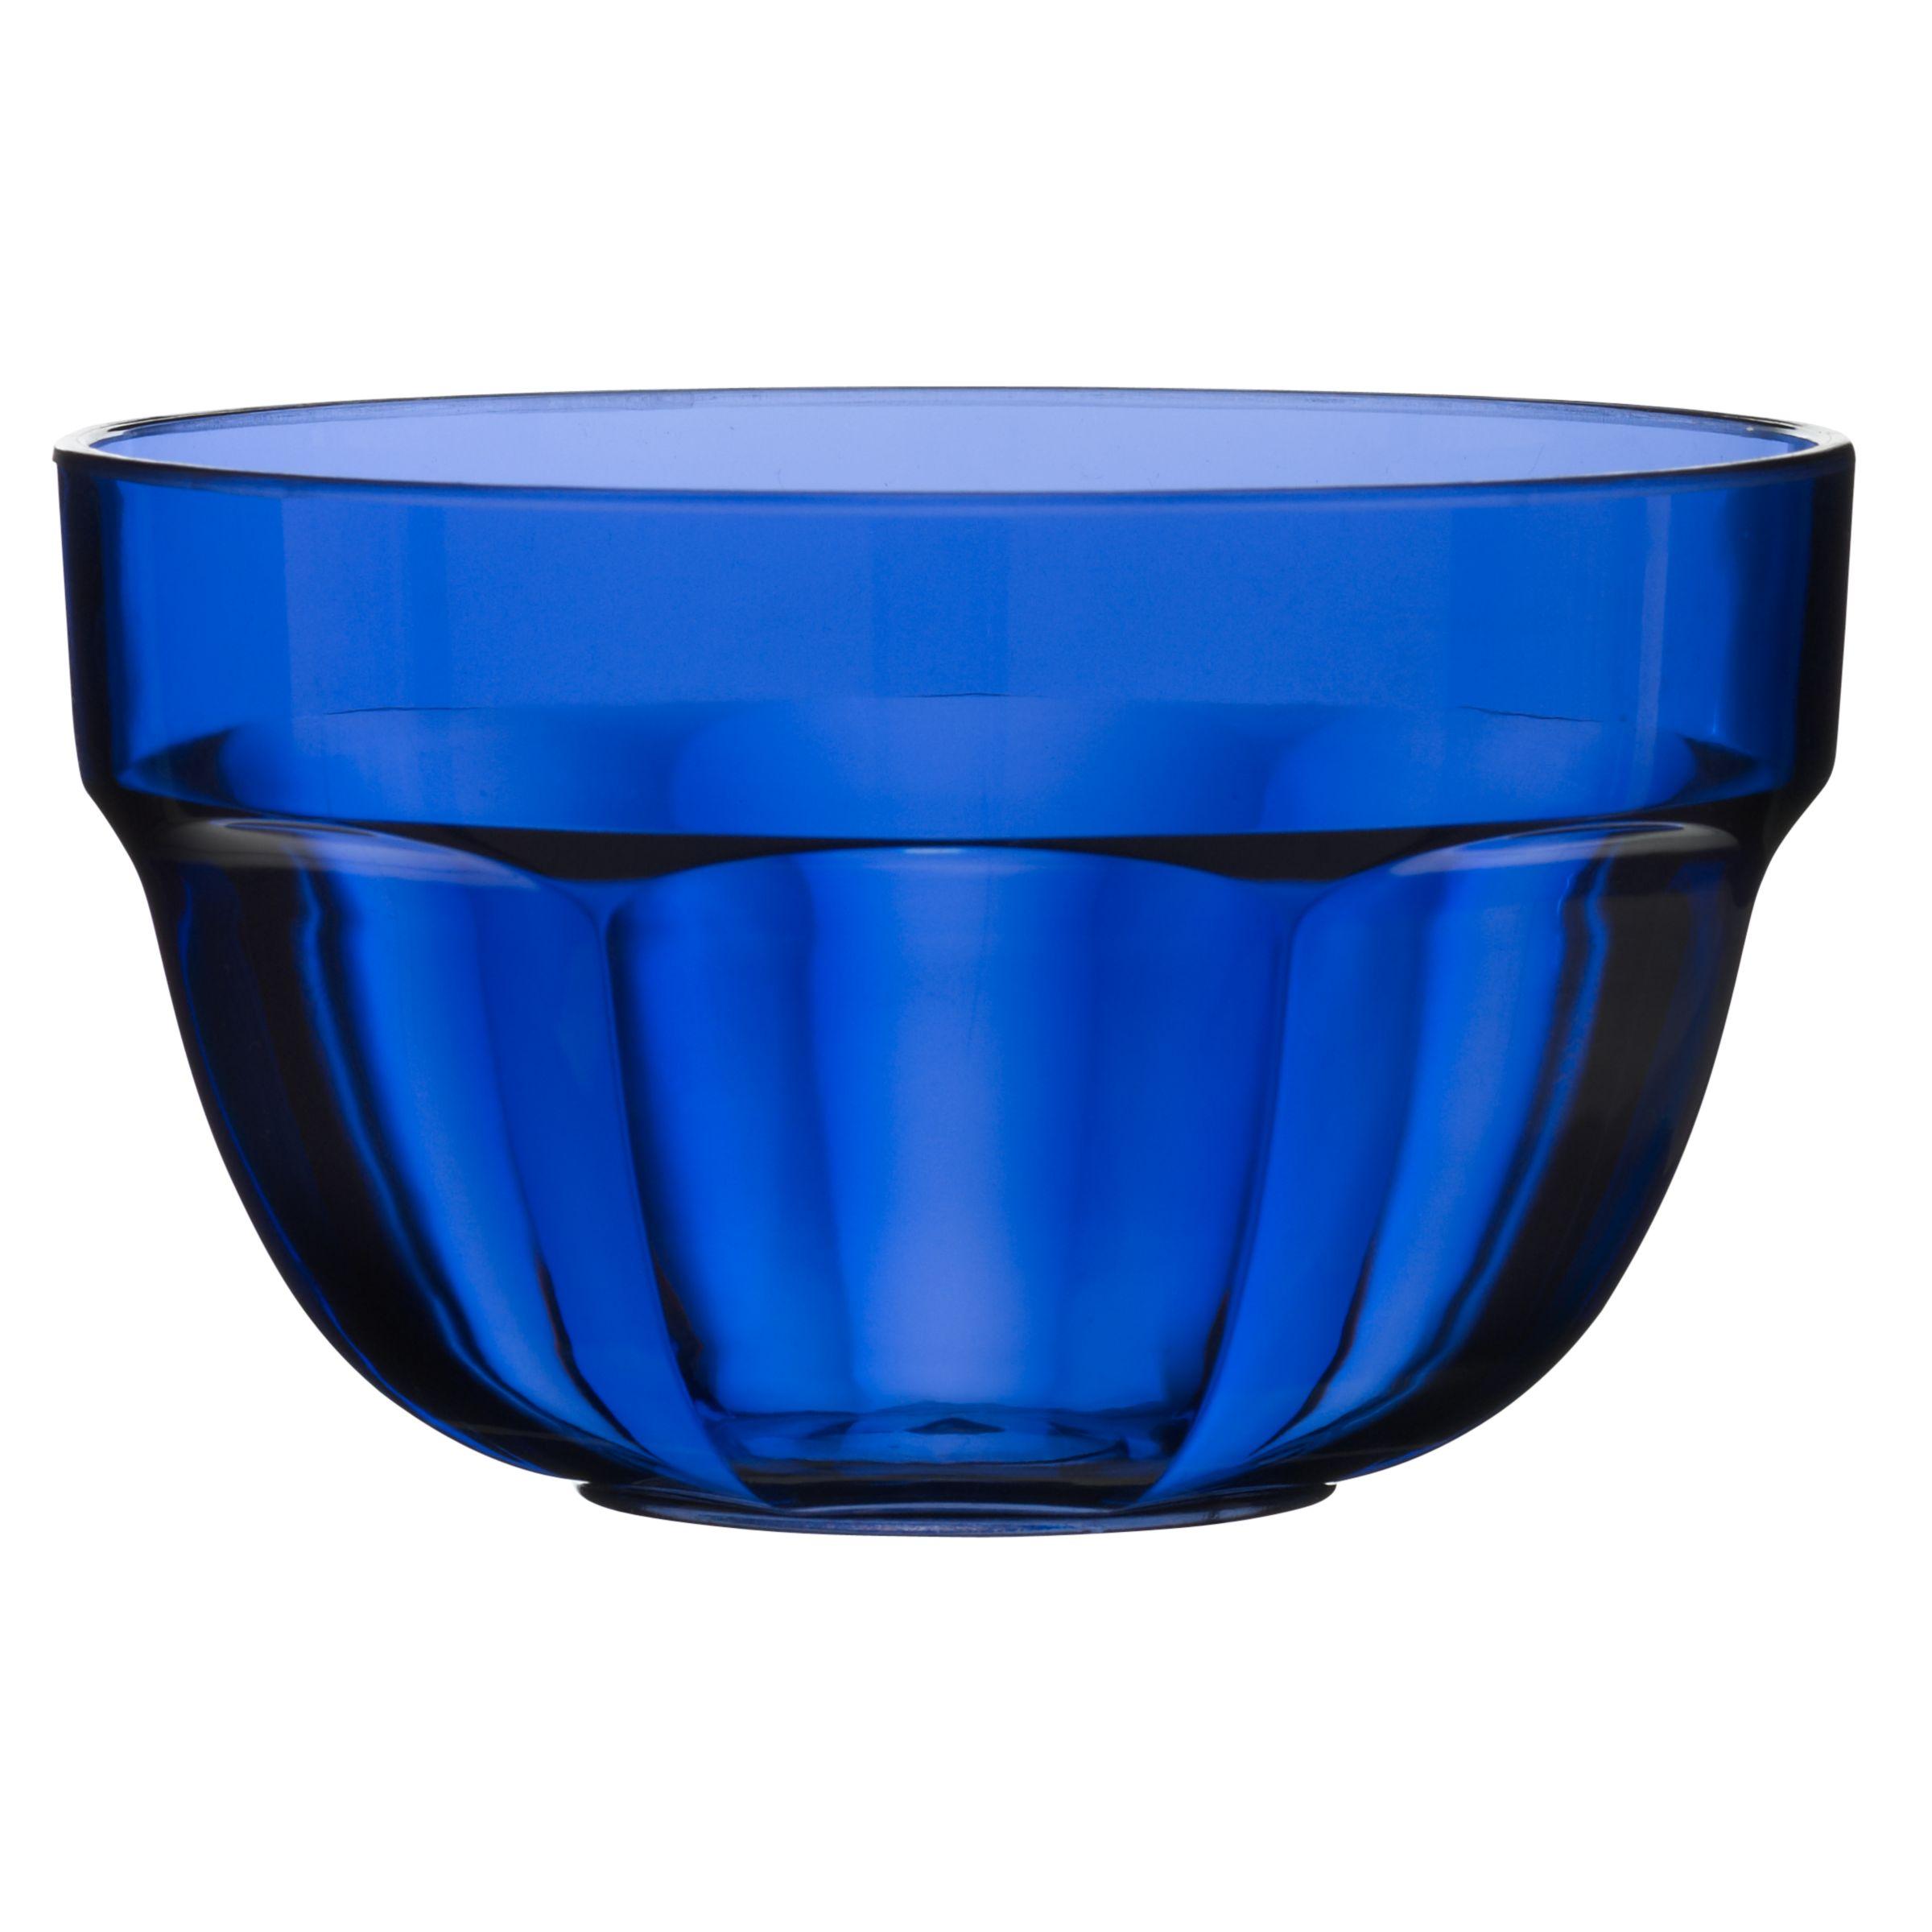 John Lewis Blue Acrylic Bowls